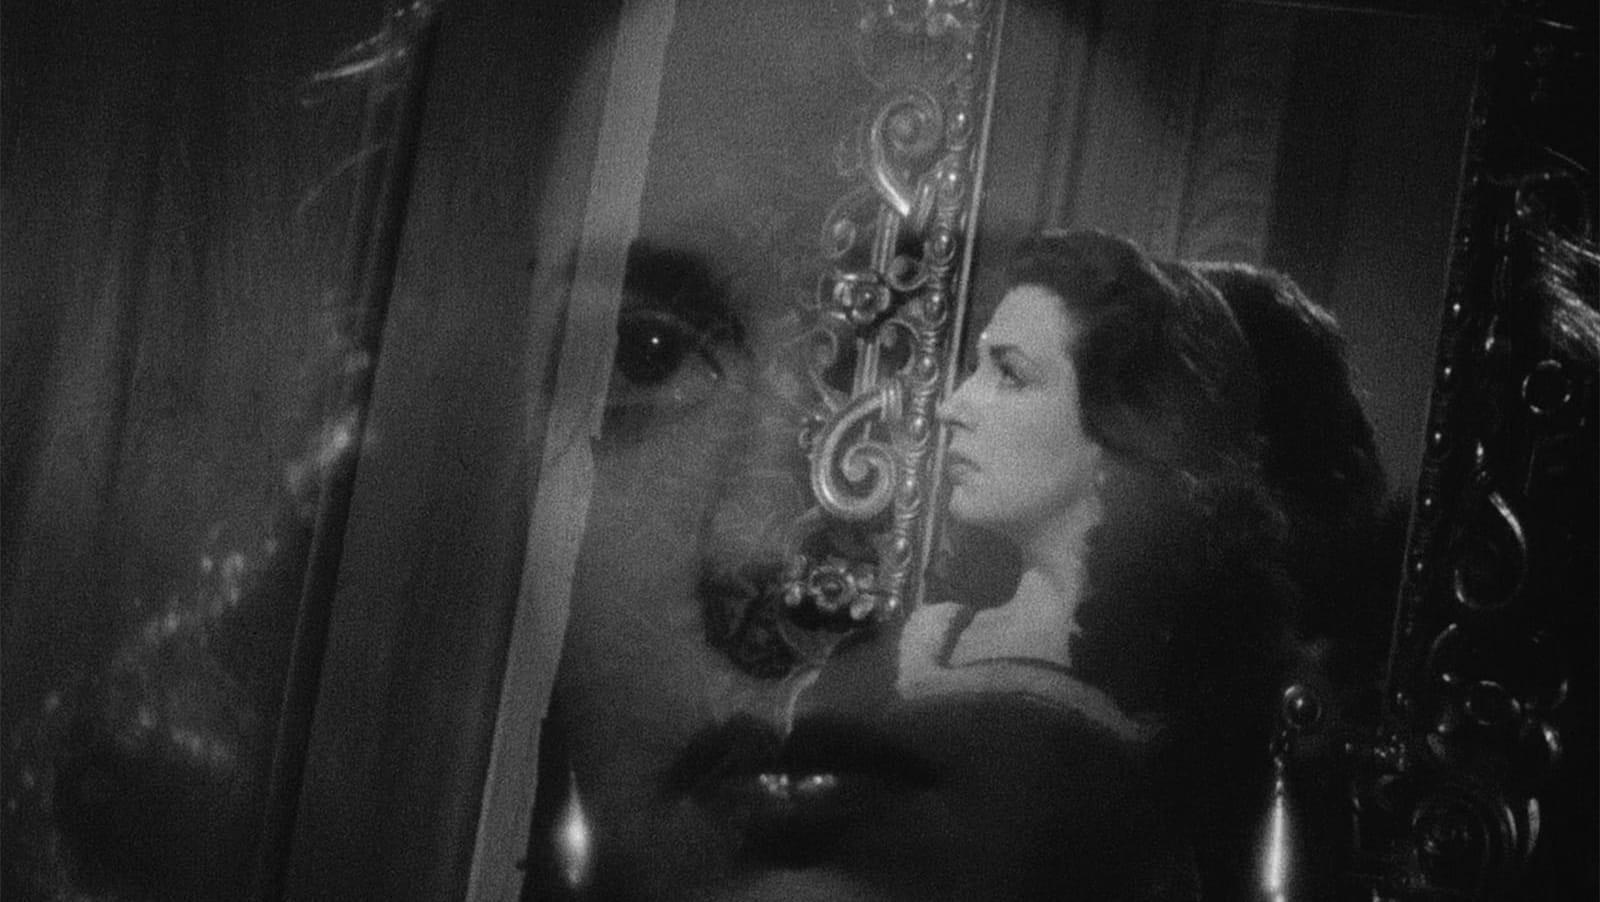 Corridor of Mirrors: The Eternal Return